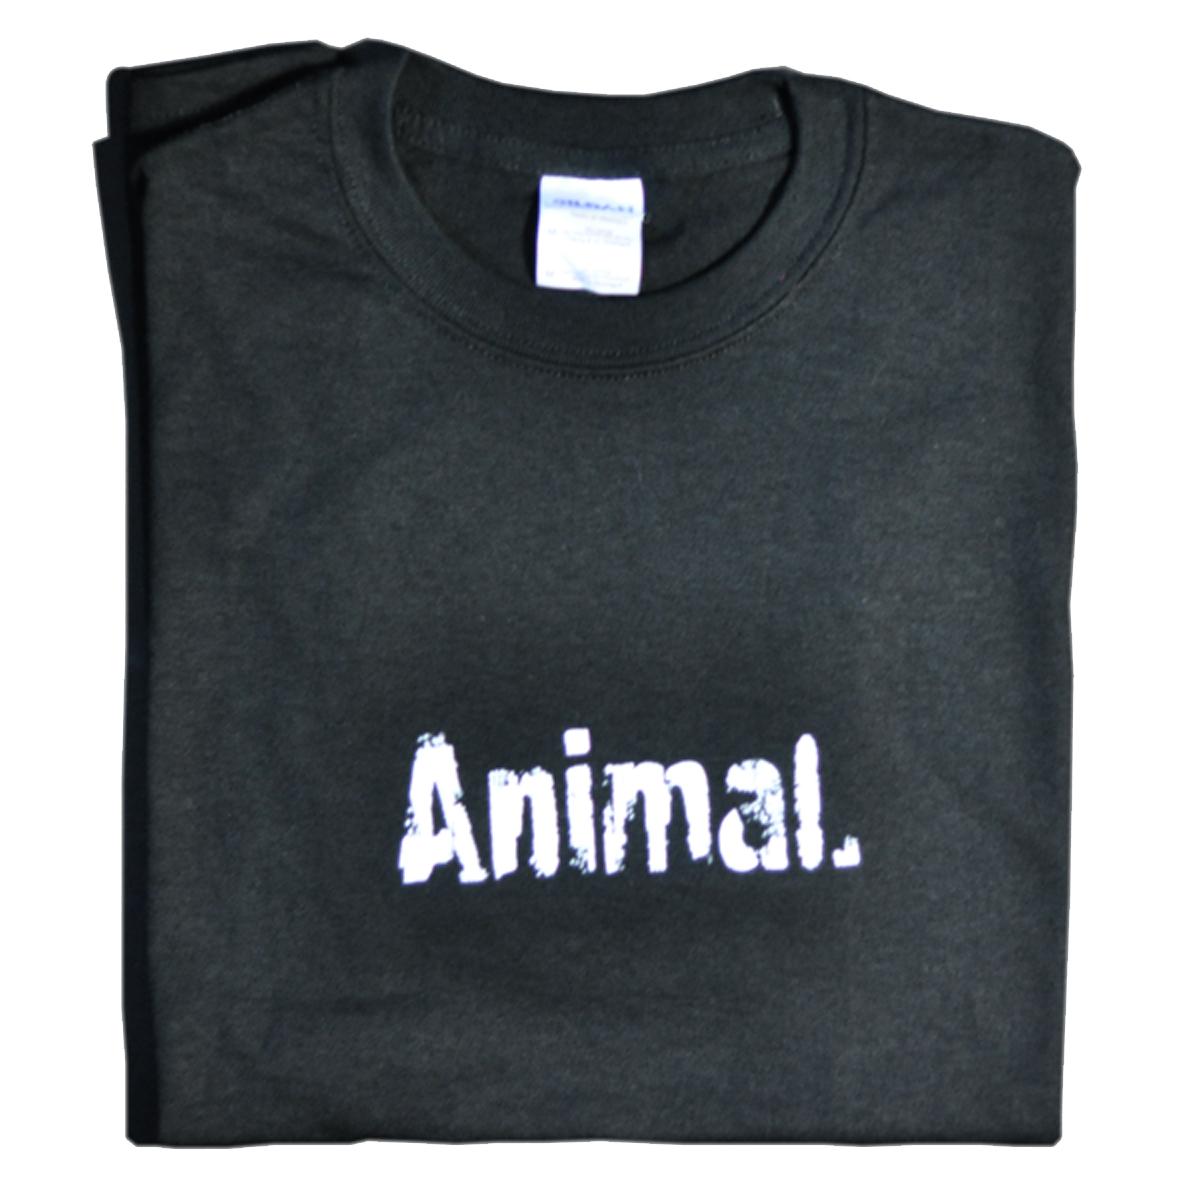 Black Animal T-Shirt Medium By Universal Nutrition